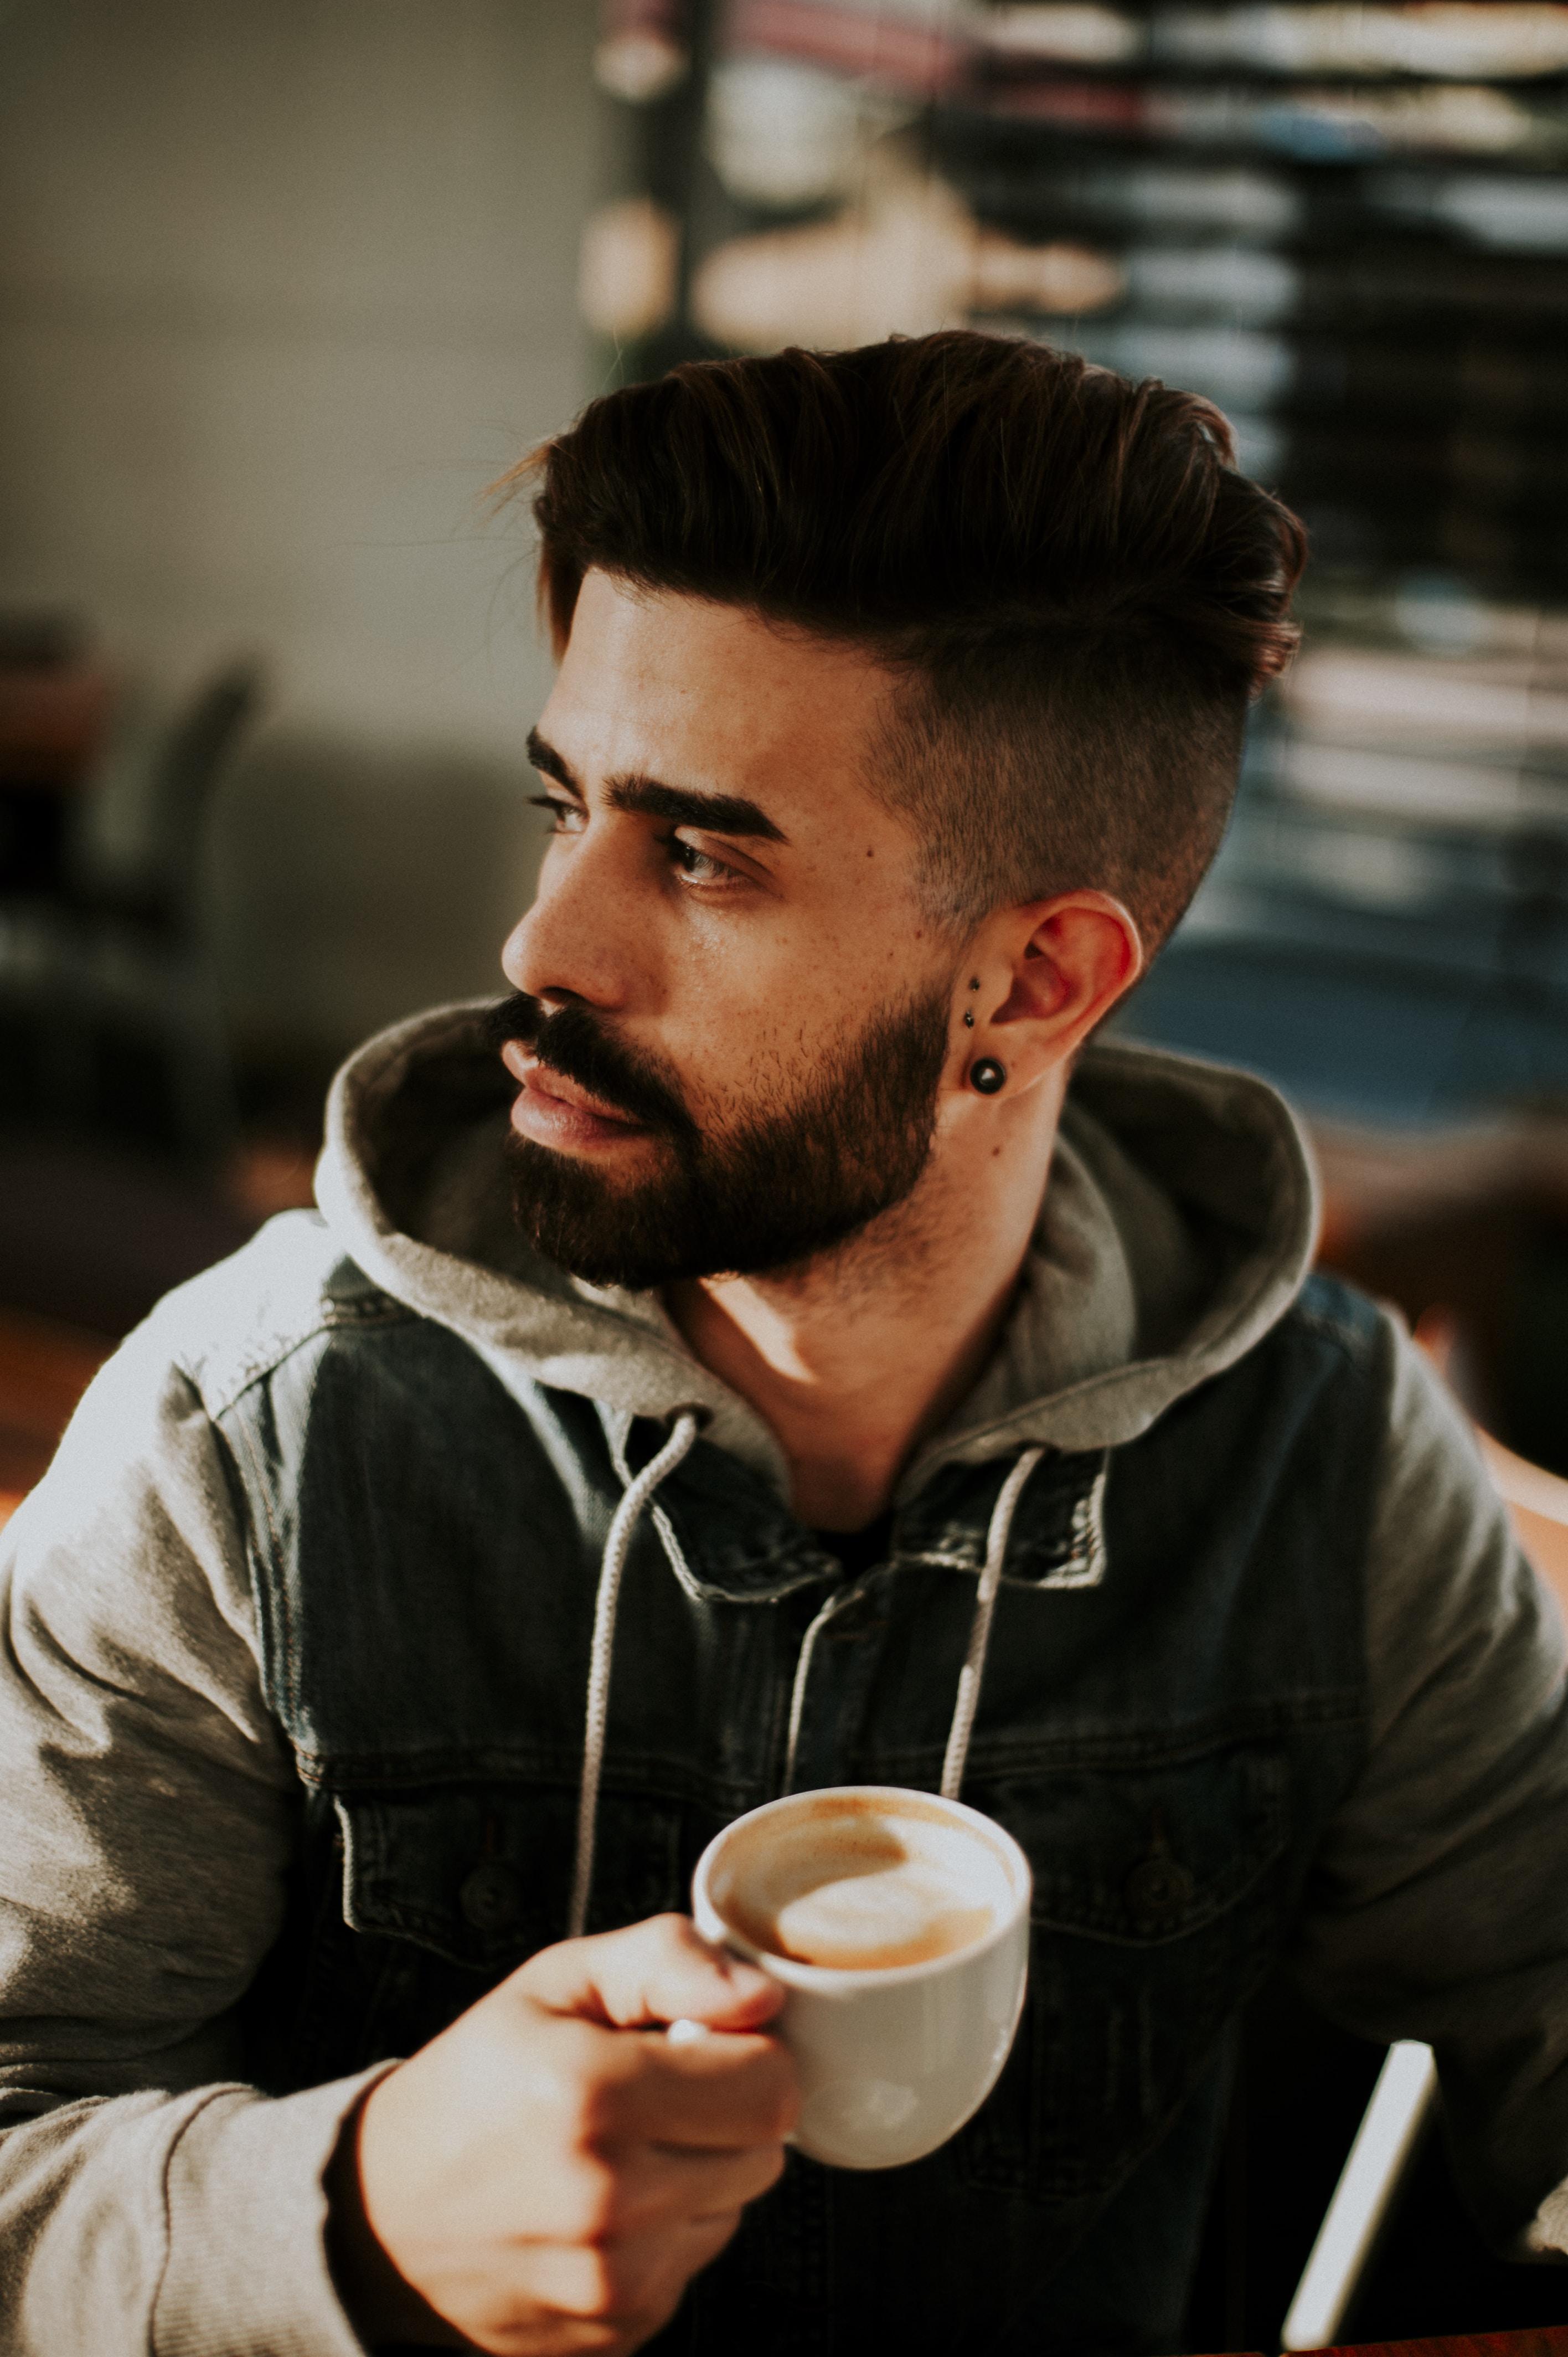 shallow focus photo of man in hoodie holding white ceramic mug